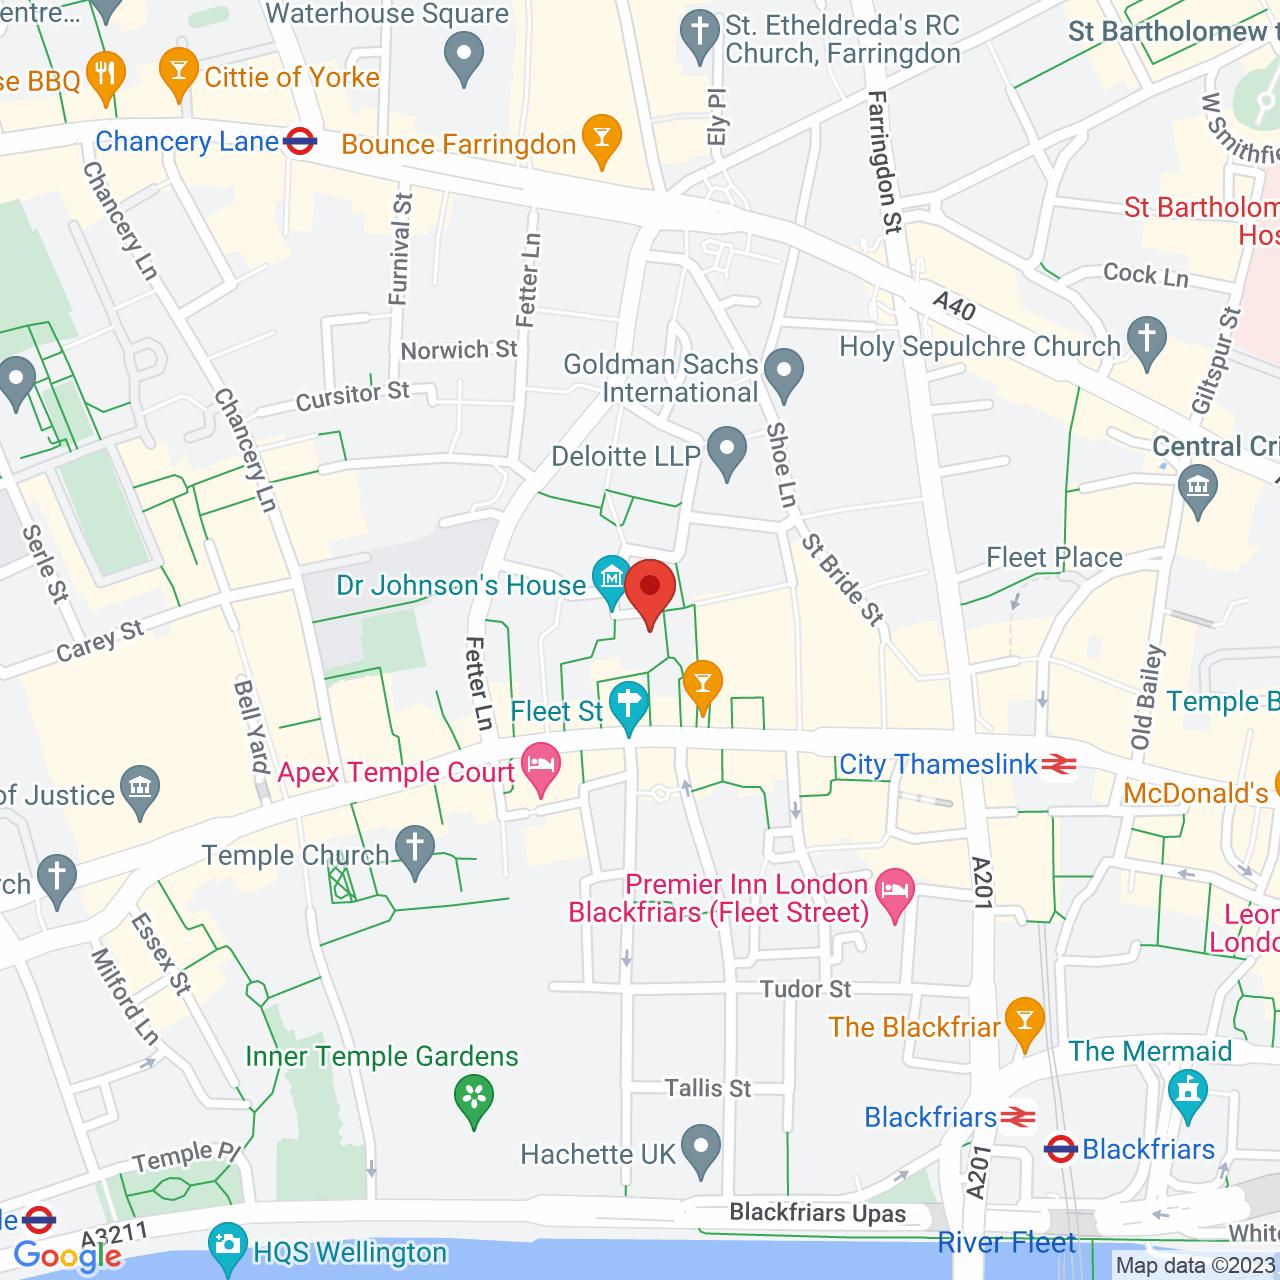 12 Gough Square, London,  EC4A 3DW, United Kingdom